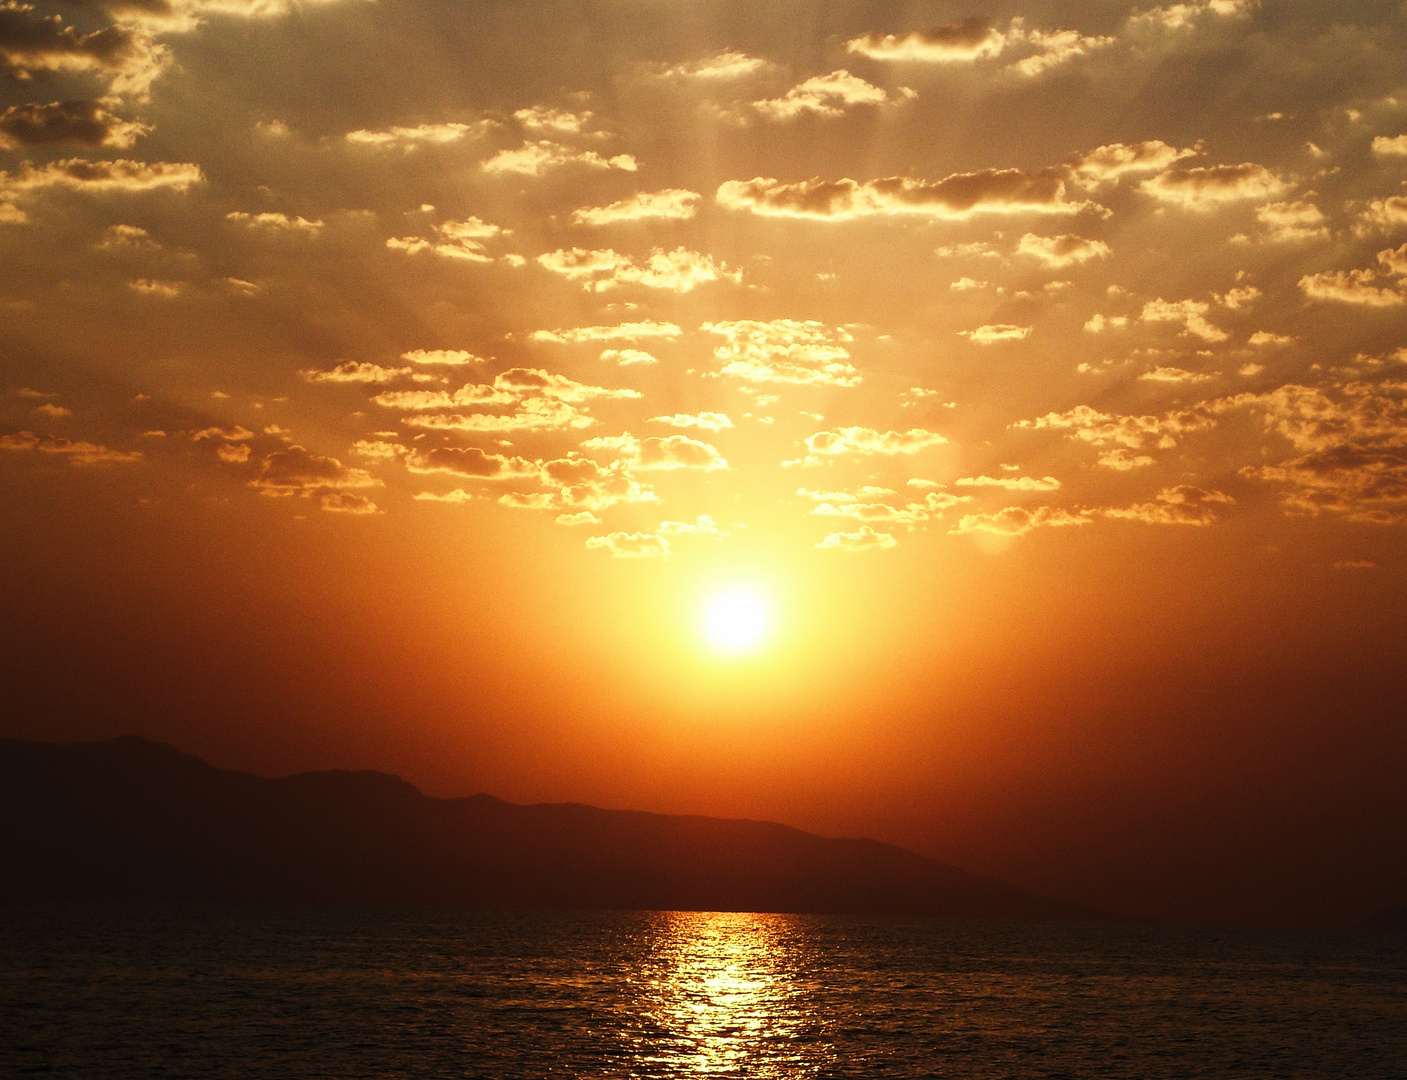 Sonnentuntergang auf dem Meer